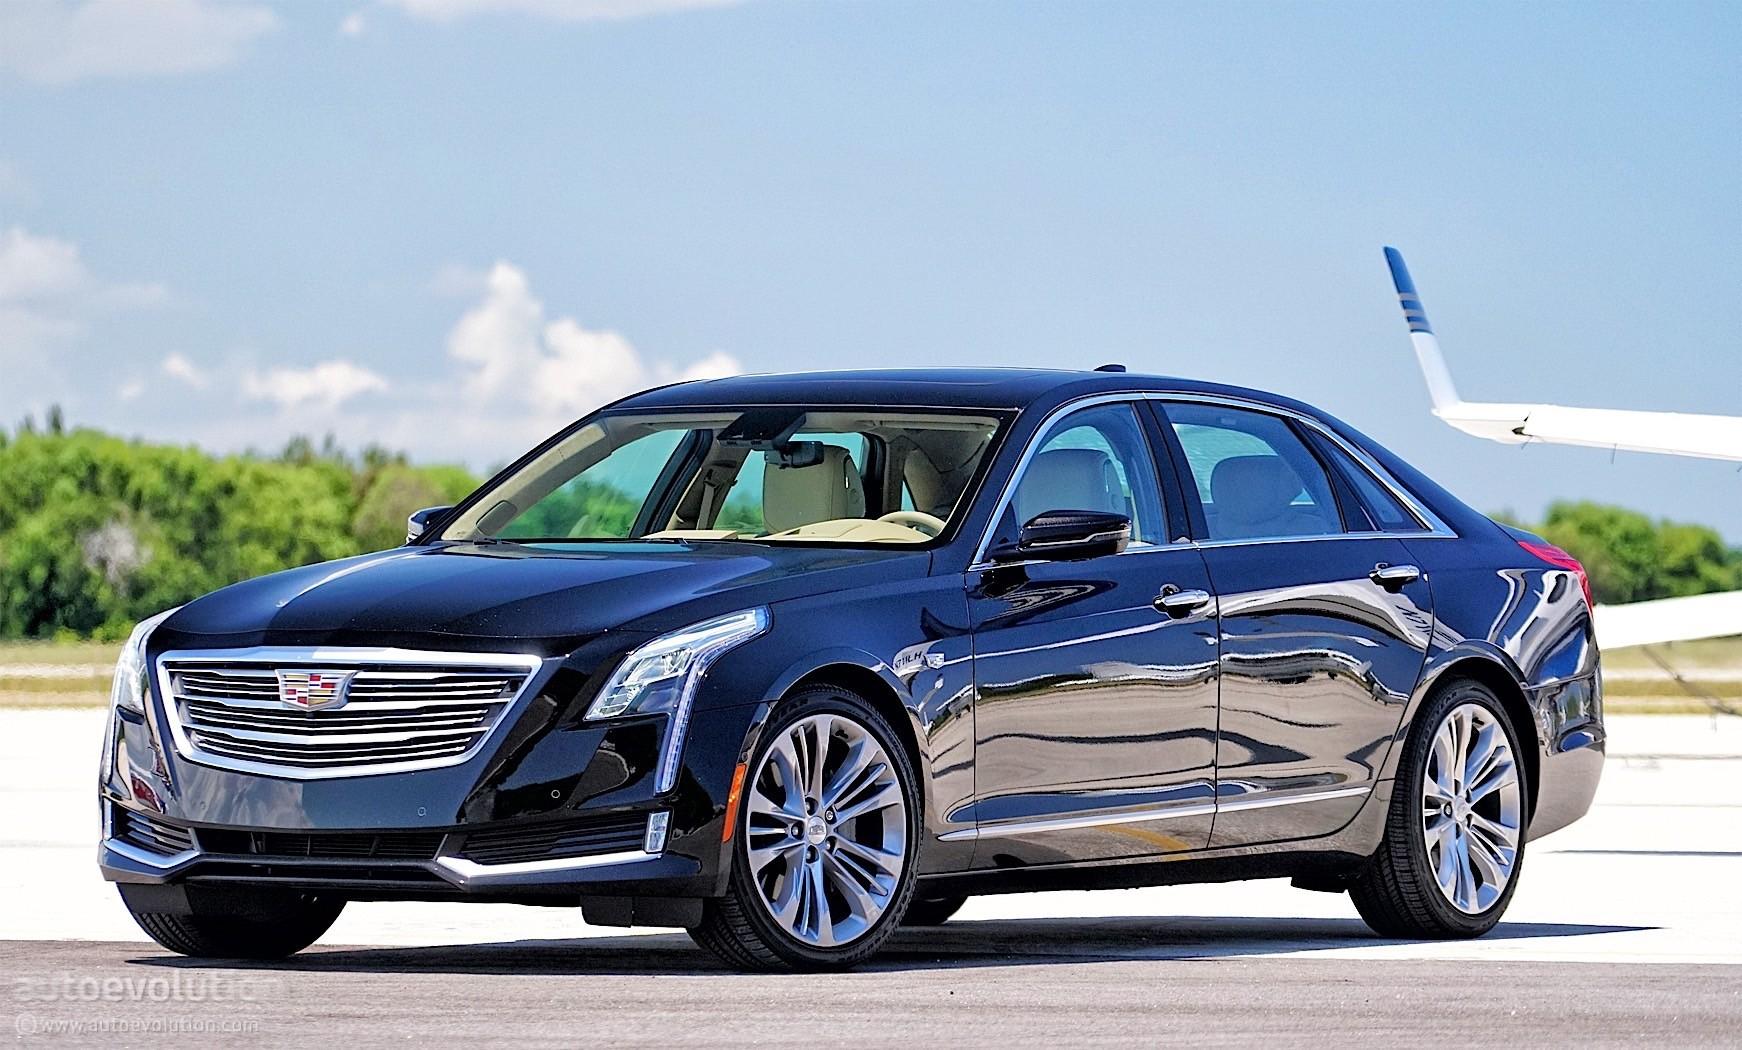 Driven: 2016 Cadillac CT6 Platinum AWD